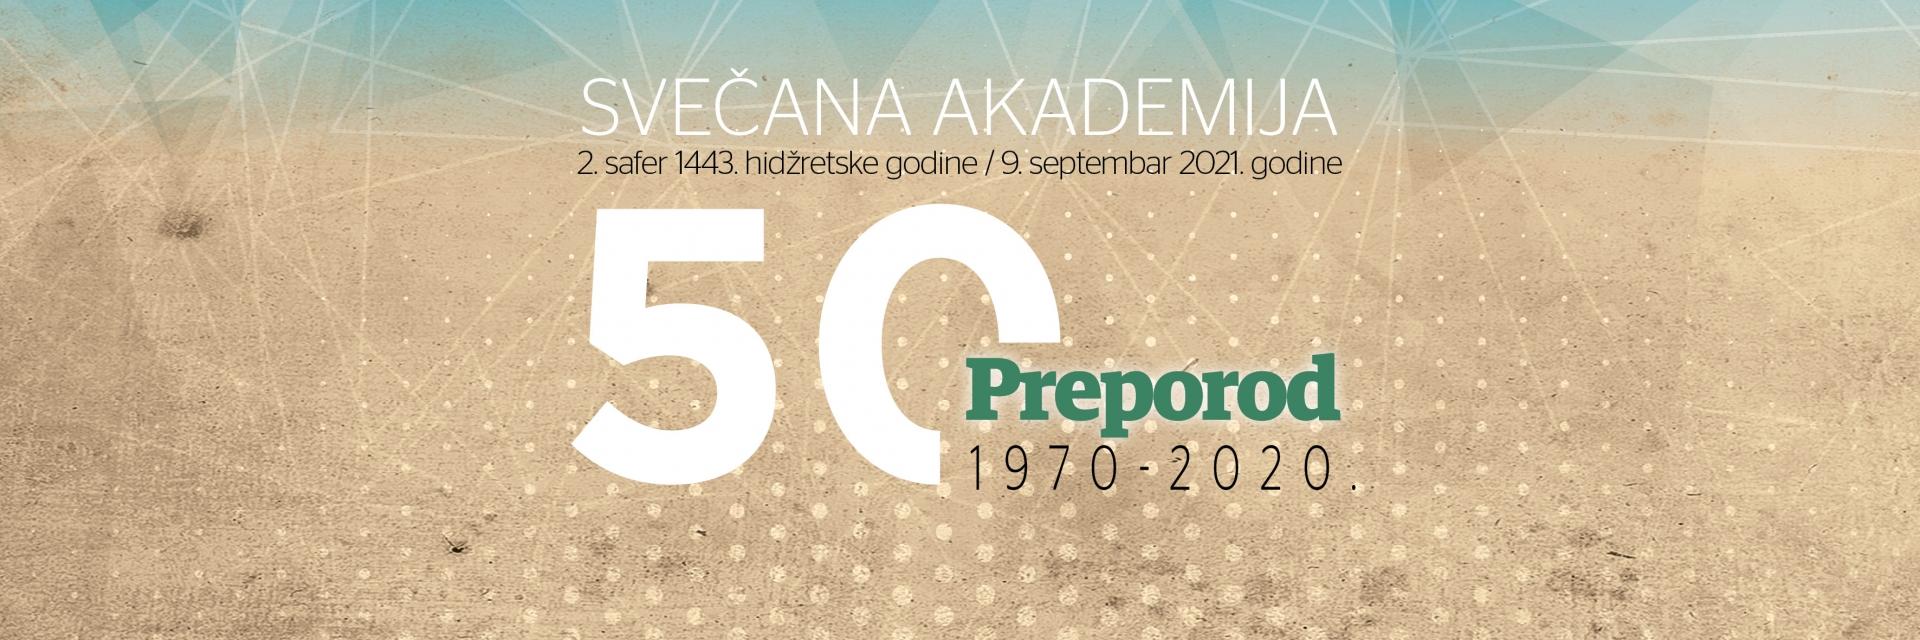 Svečana akademija povodom 50. godišnjice Preporoda 9. septembra